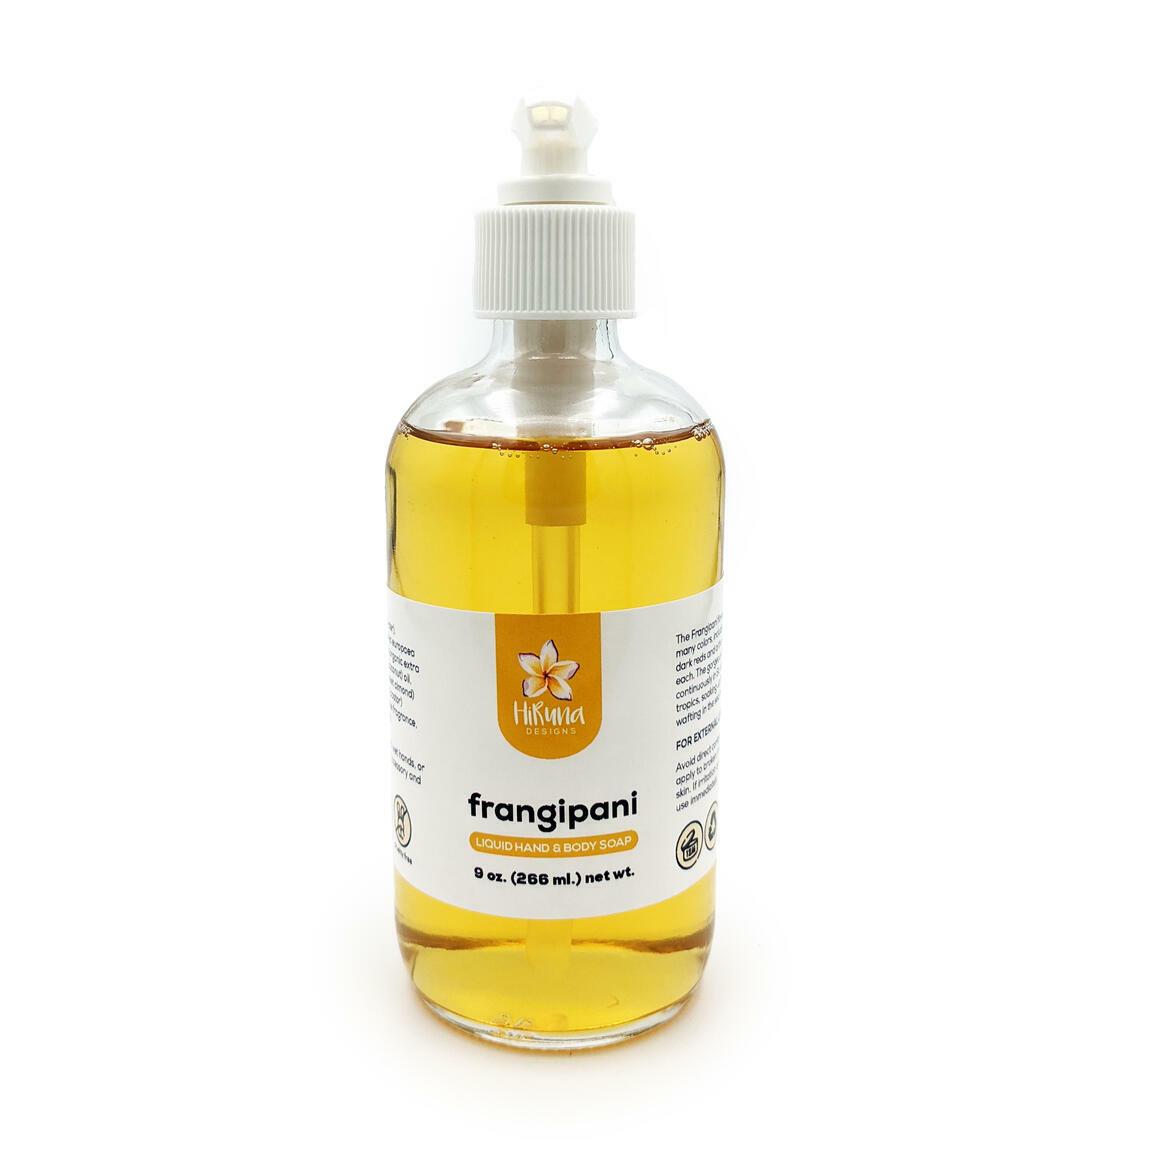 Frangipani - Liquid Hand & Body Soap | Trada Marketplace